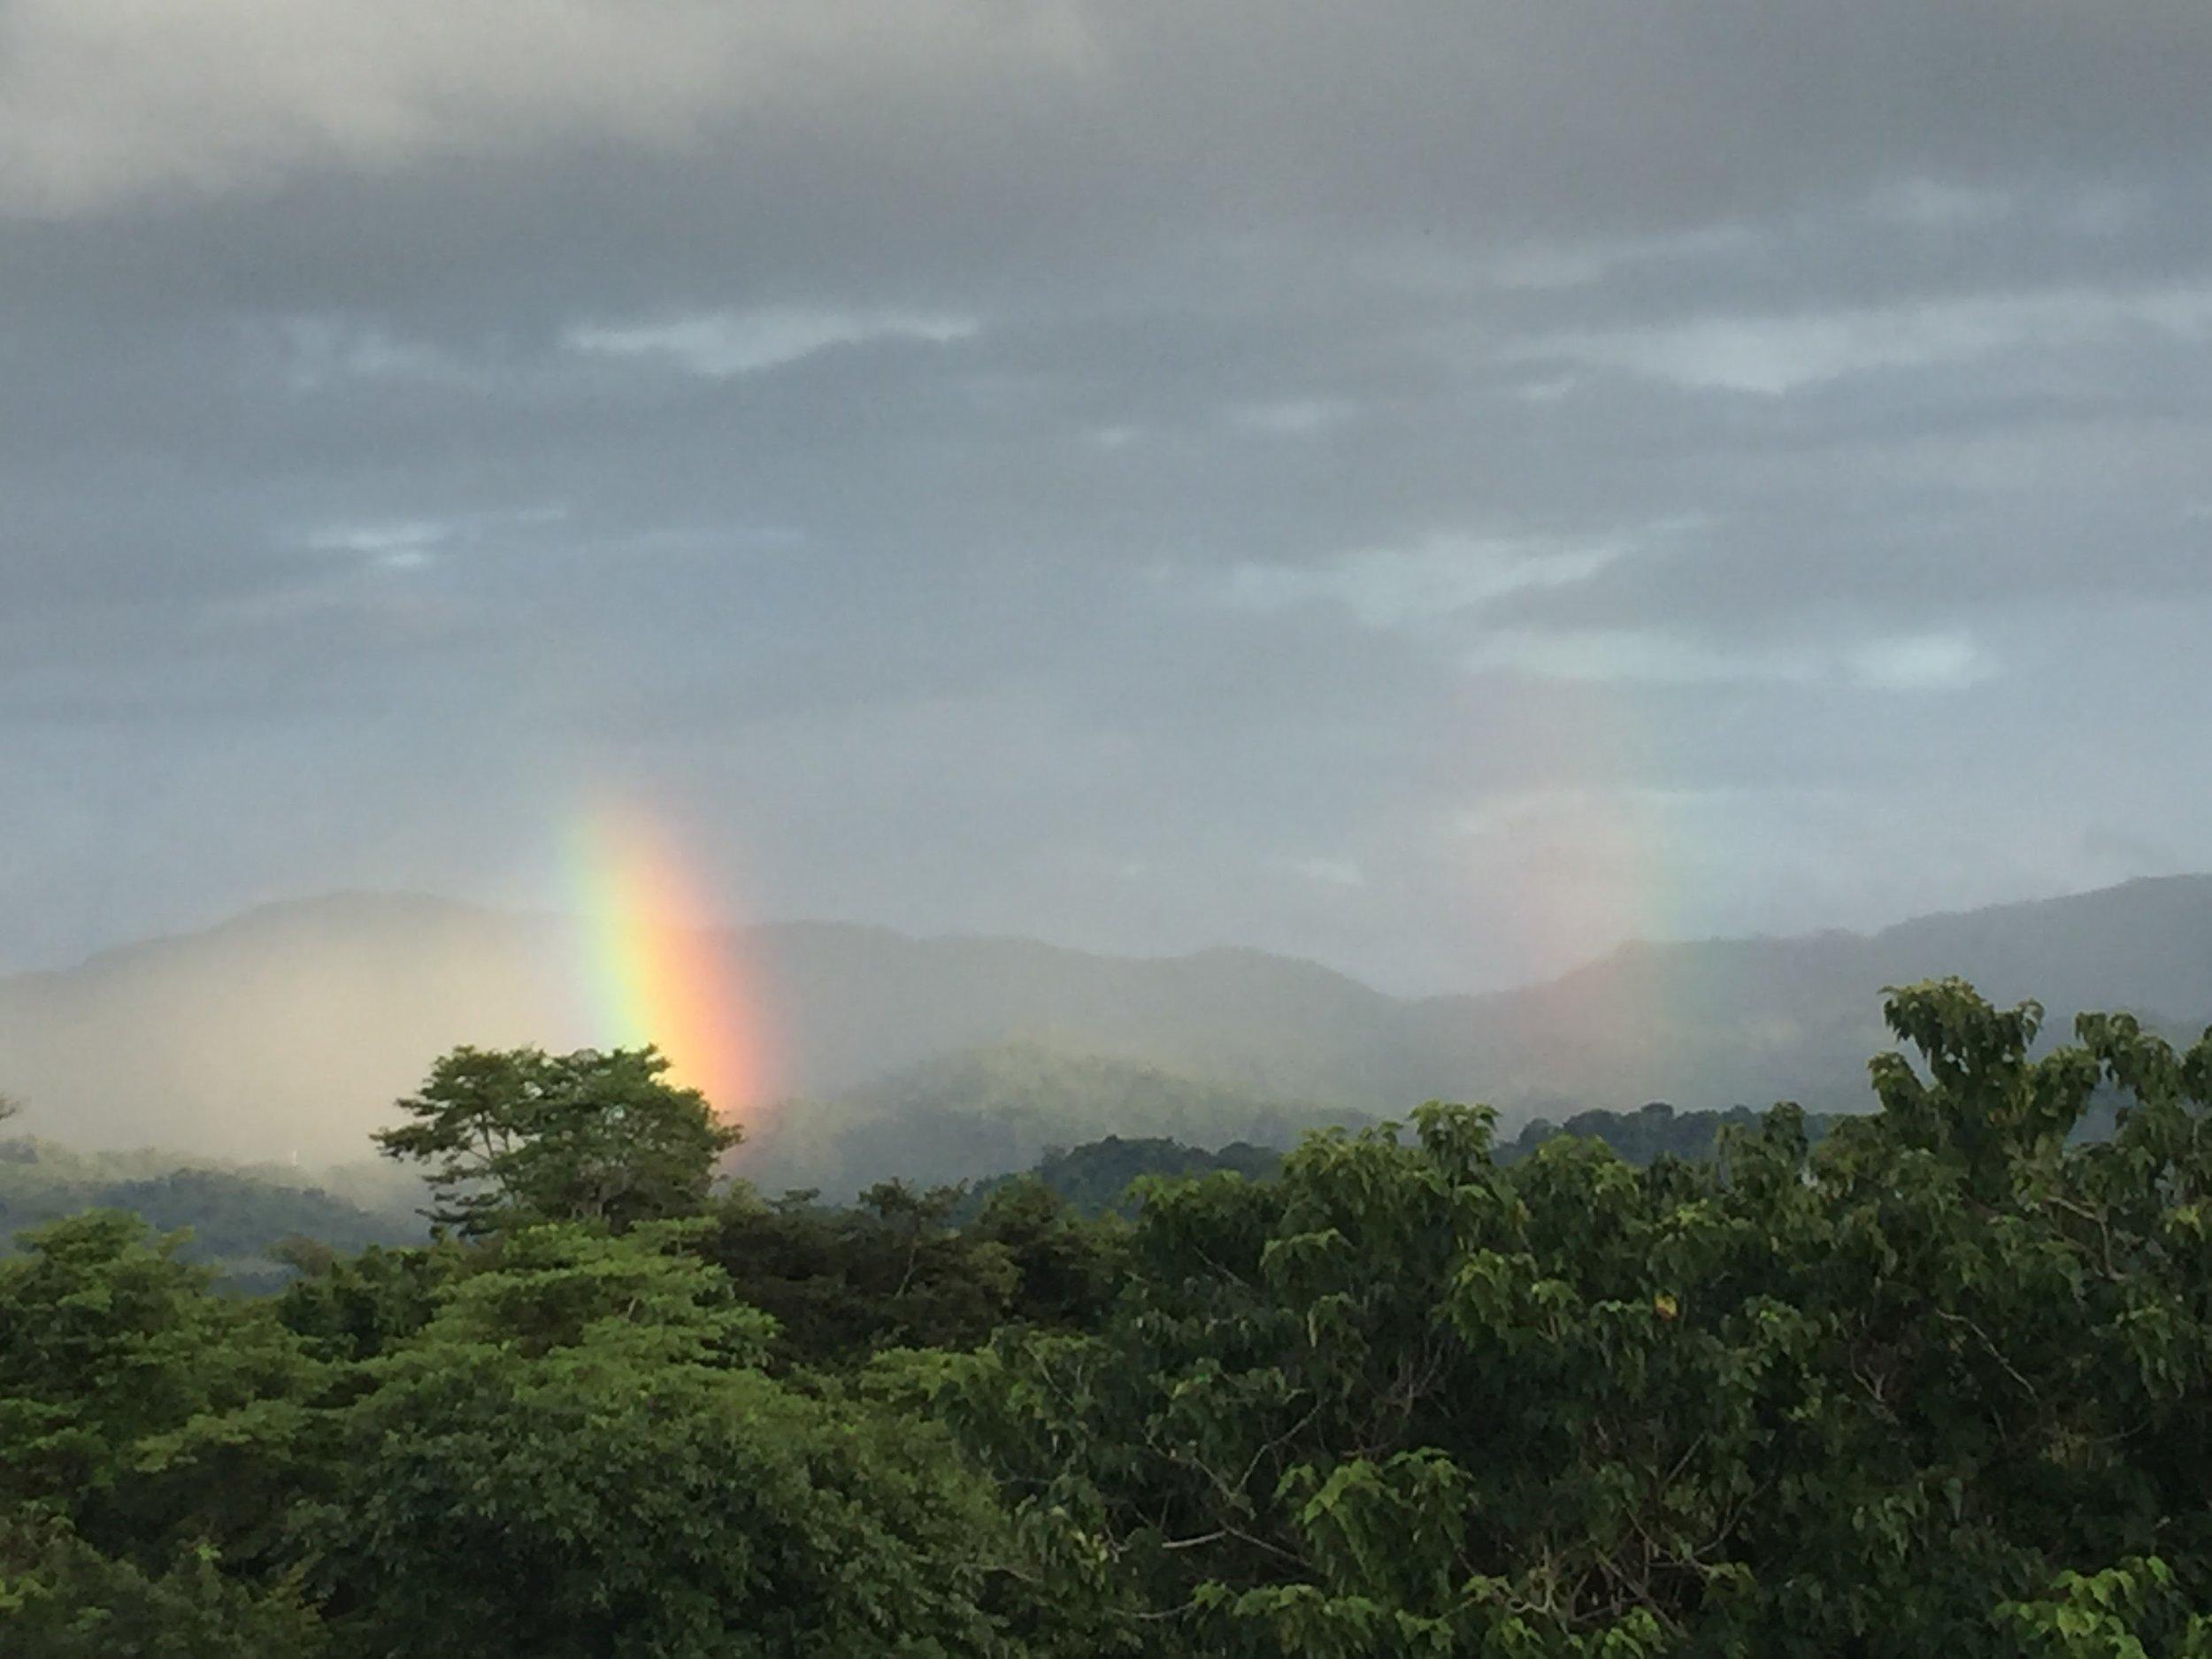 double rainbow over property